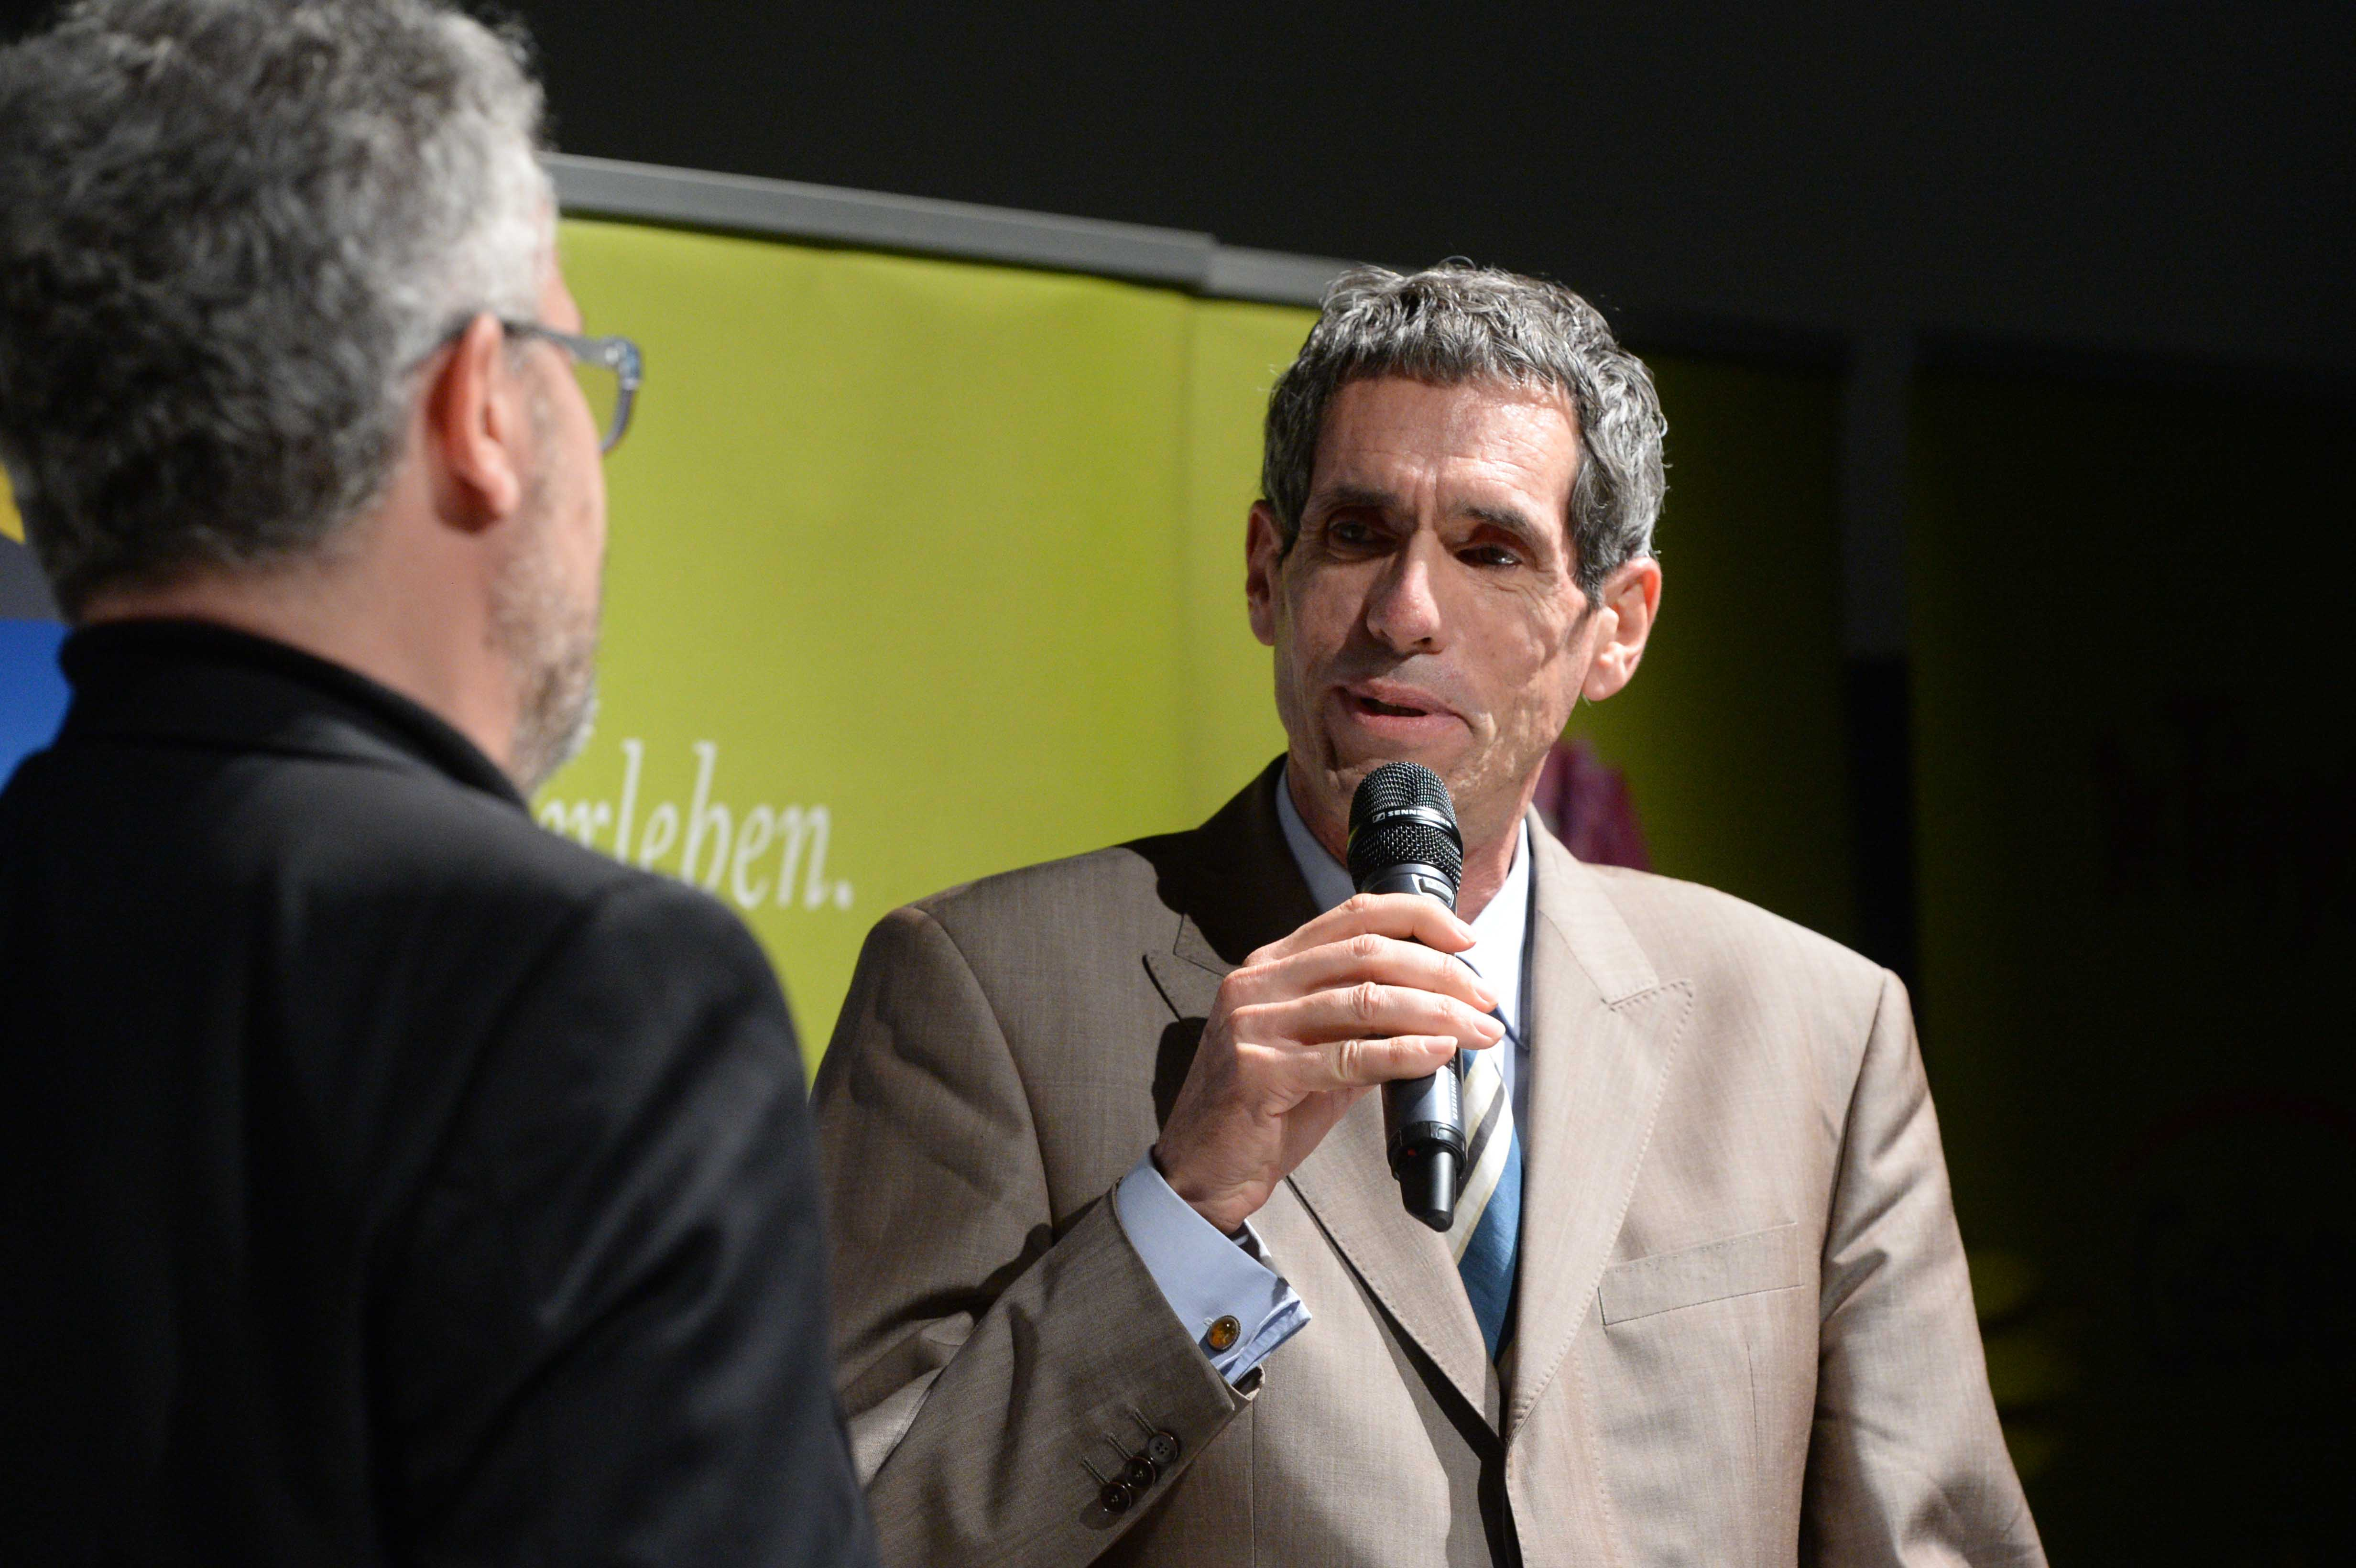 Columbus Film Preisverleihung 2015 Silber Juergen Drensek Talk mit Thomas Radler web